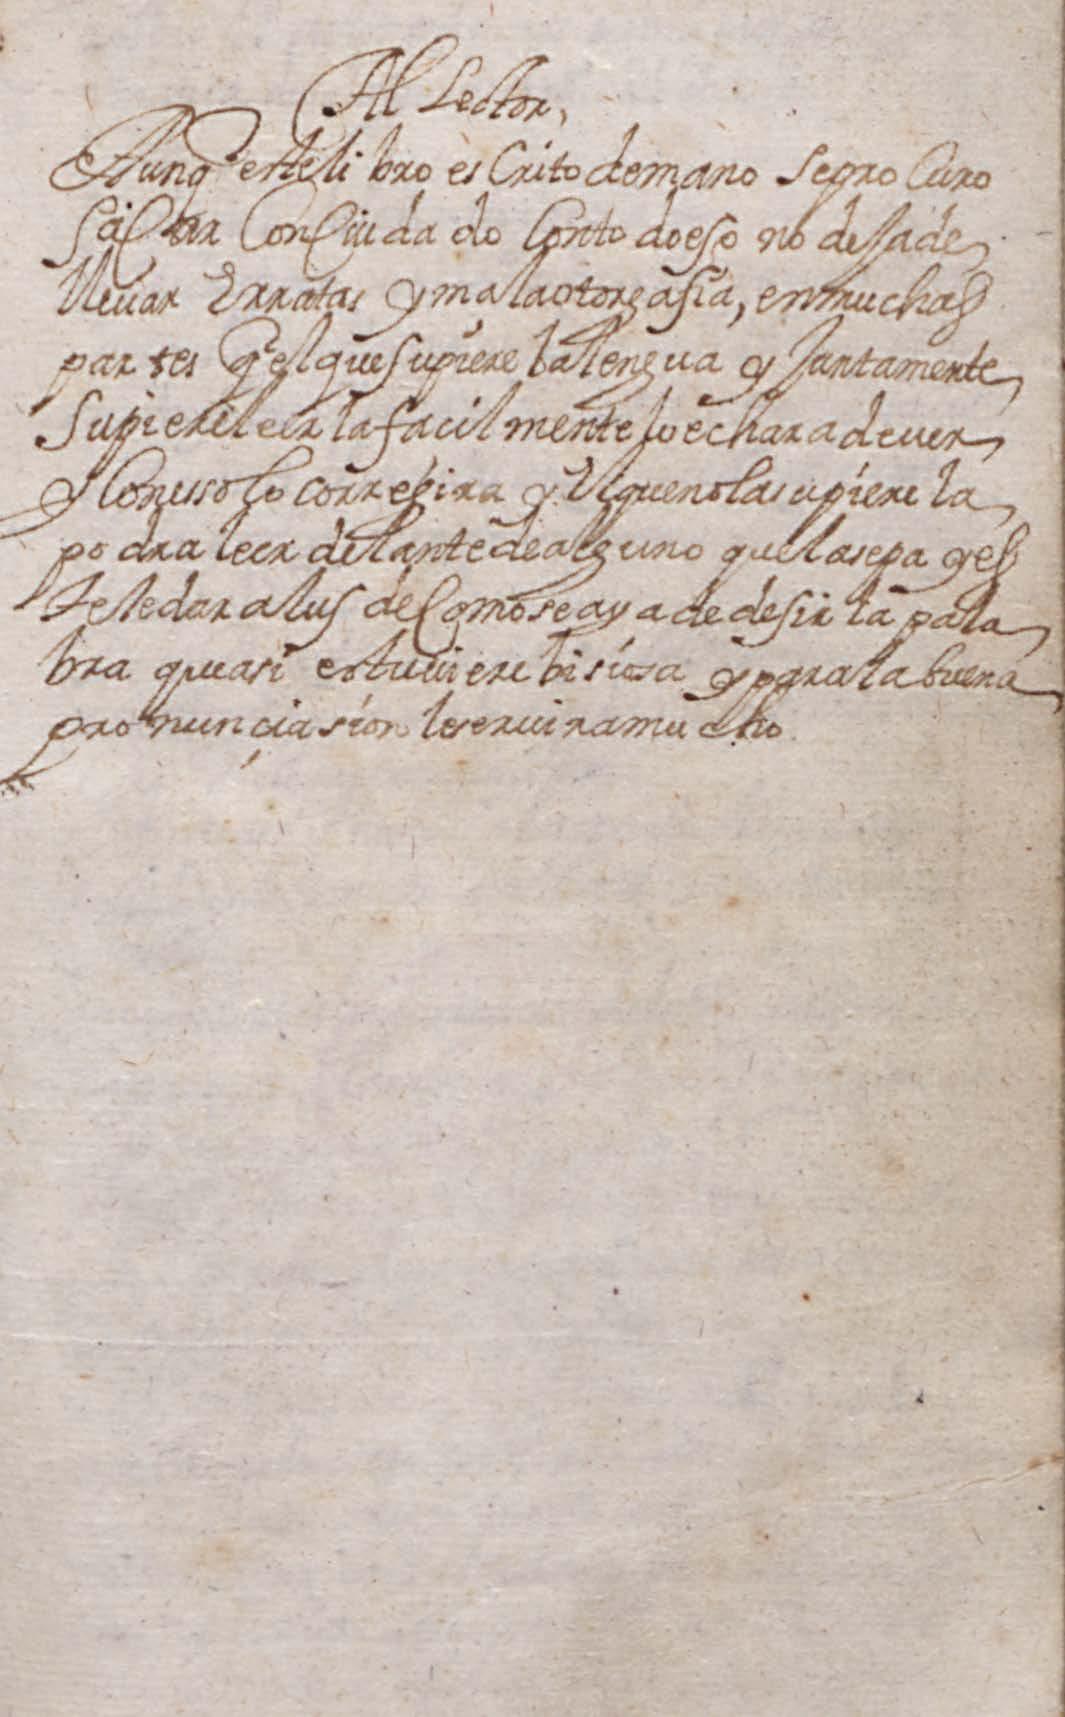 Manuscrito 158 BNC Portada iii r.jpg